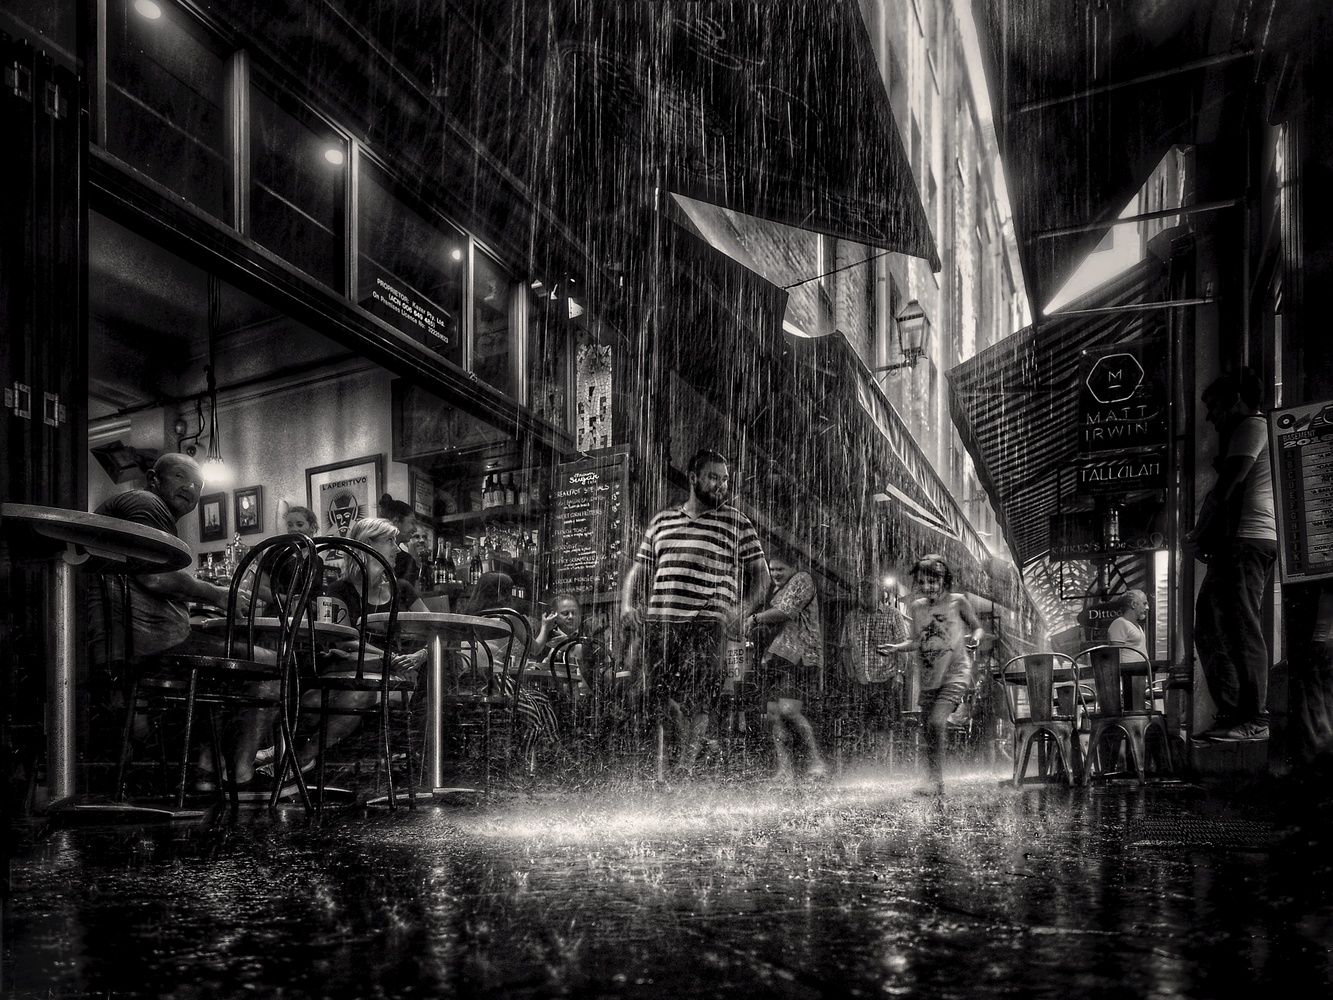 Dancing in the Rain by David Hein